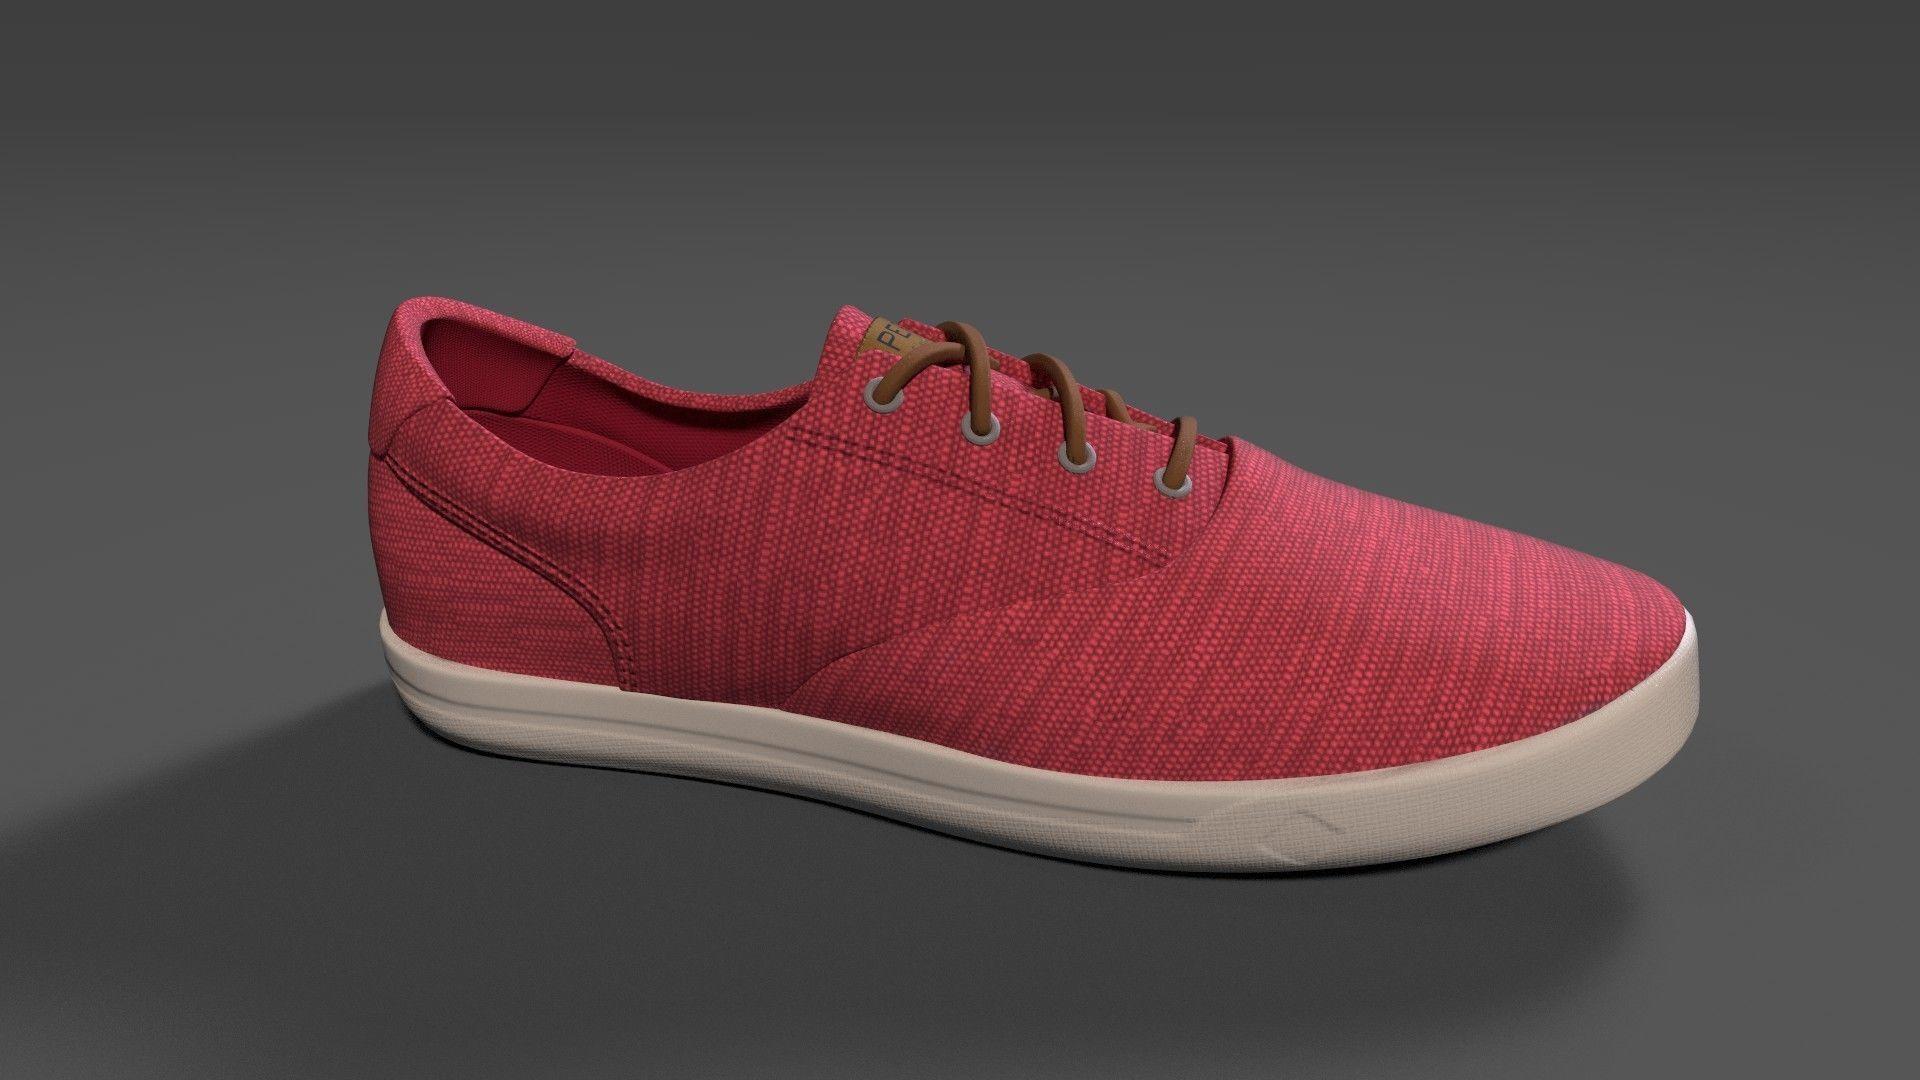 SPERRY Mens Striper II CVO Baja Sneakers | 3D model